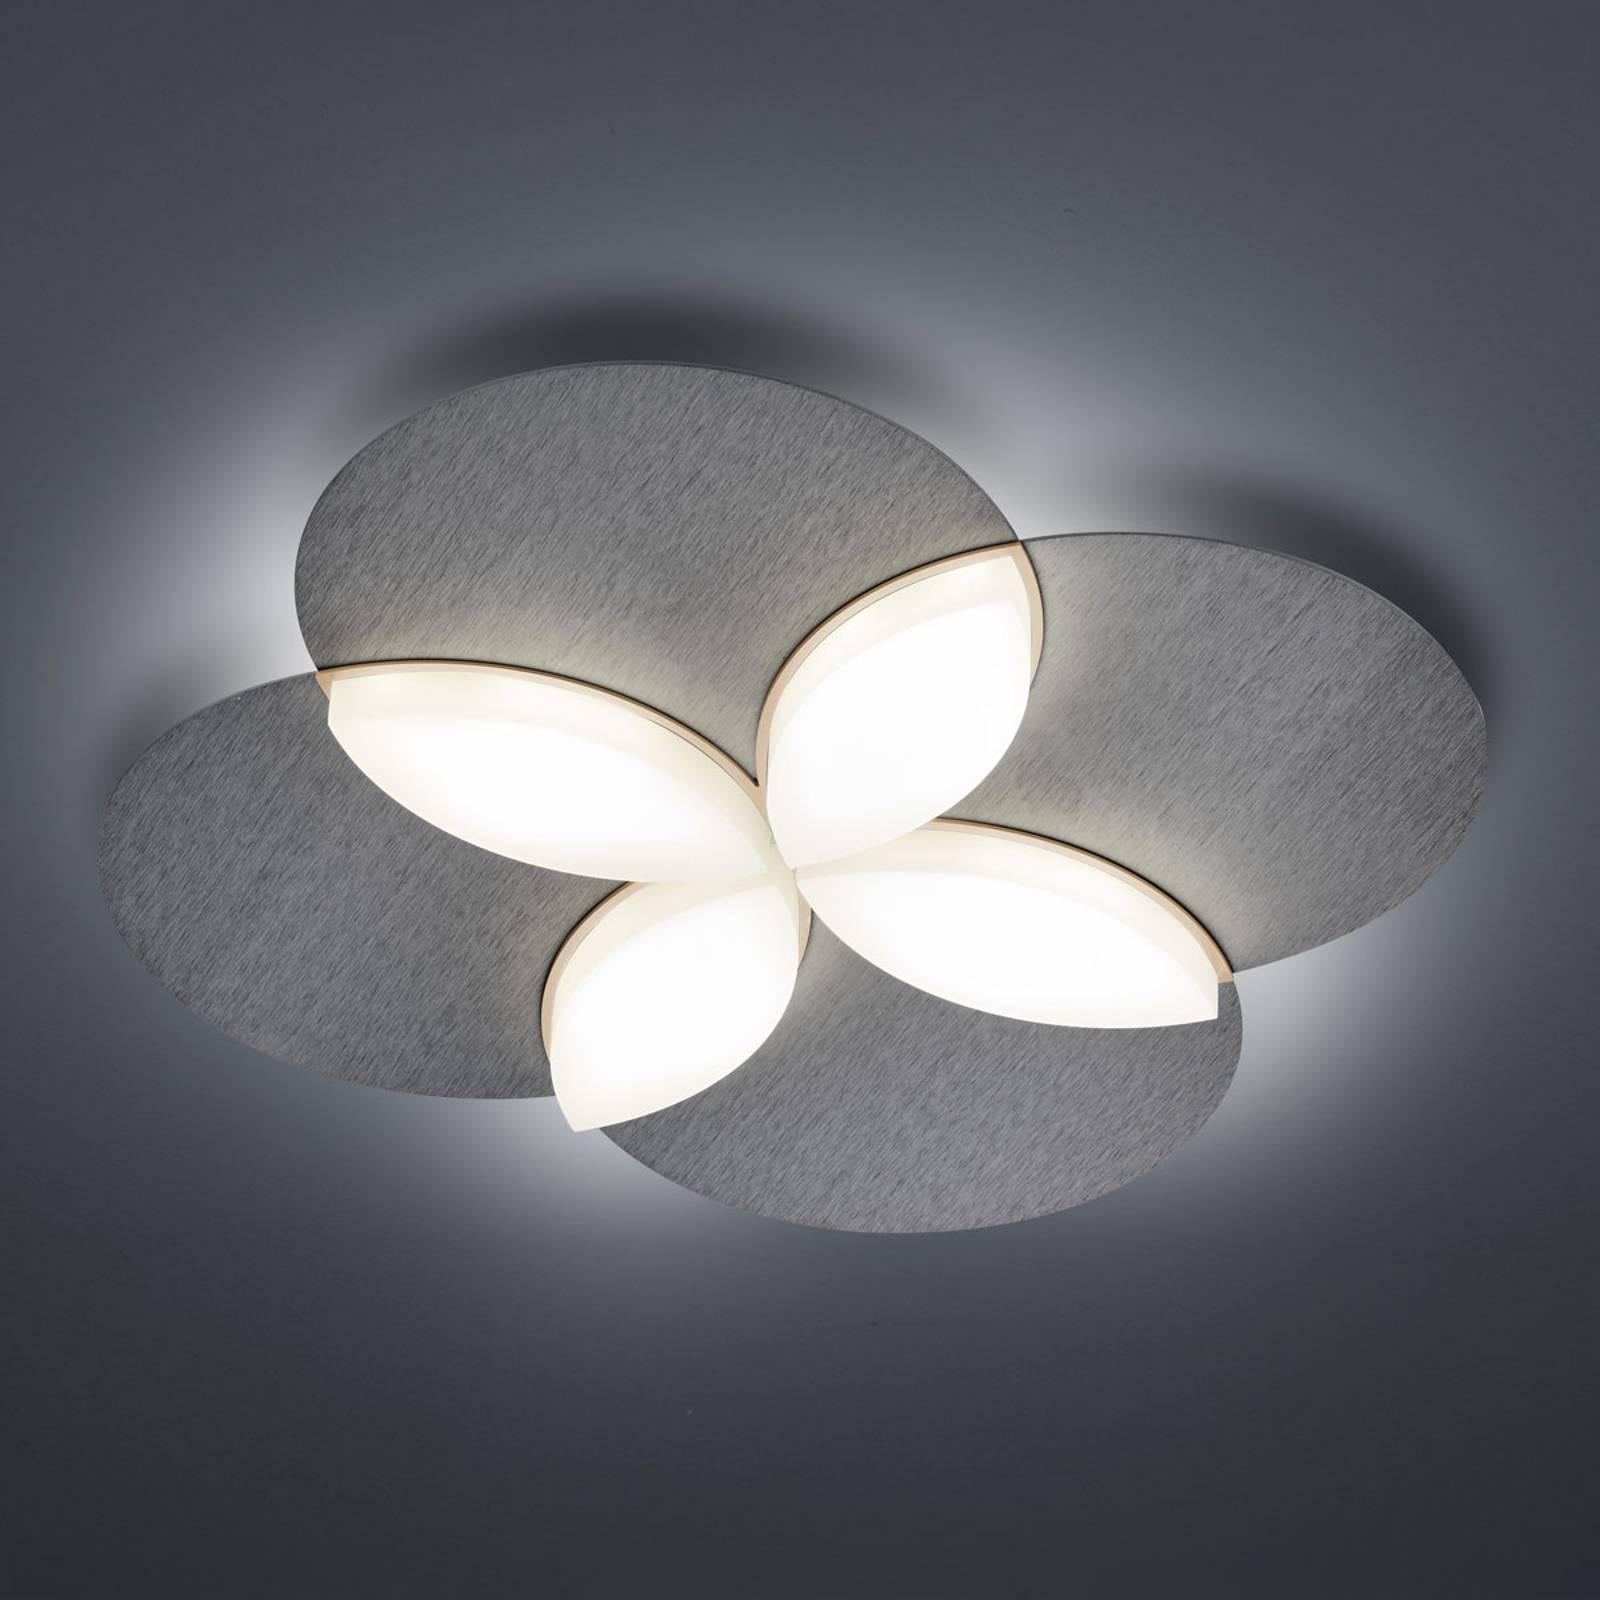 BANKAMP Spring -LED-kattovalo, matta-antrasiitti